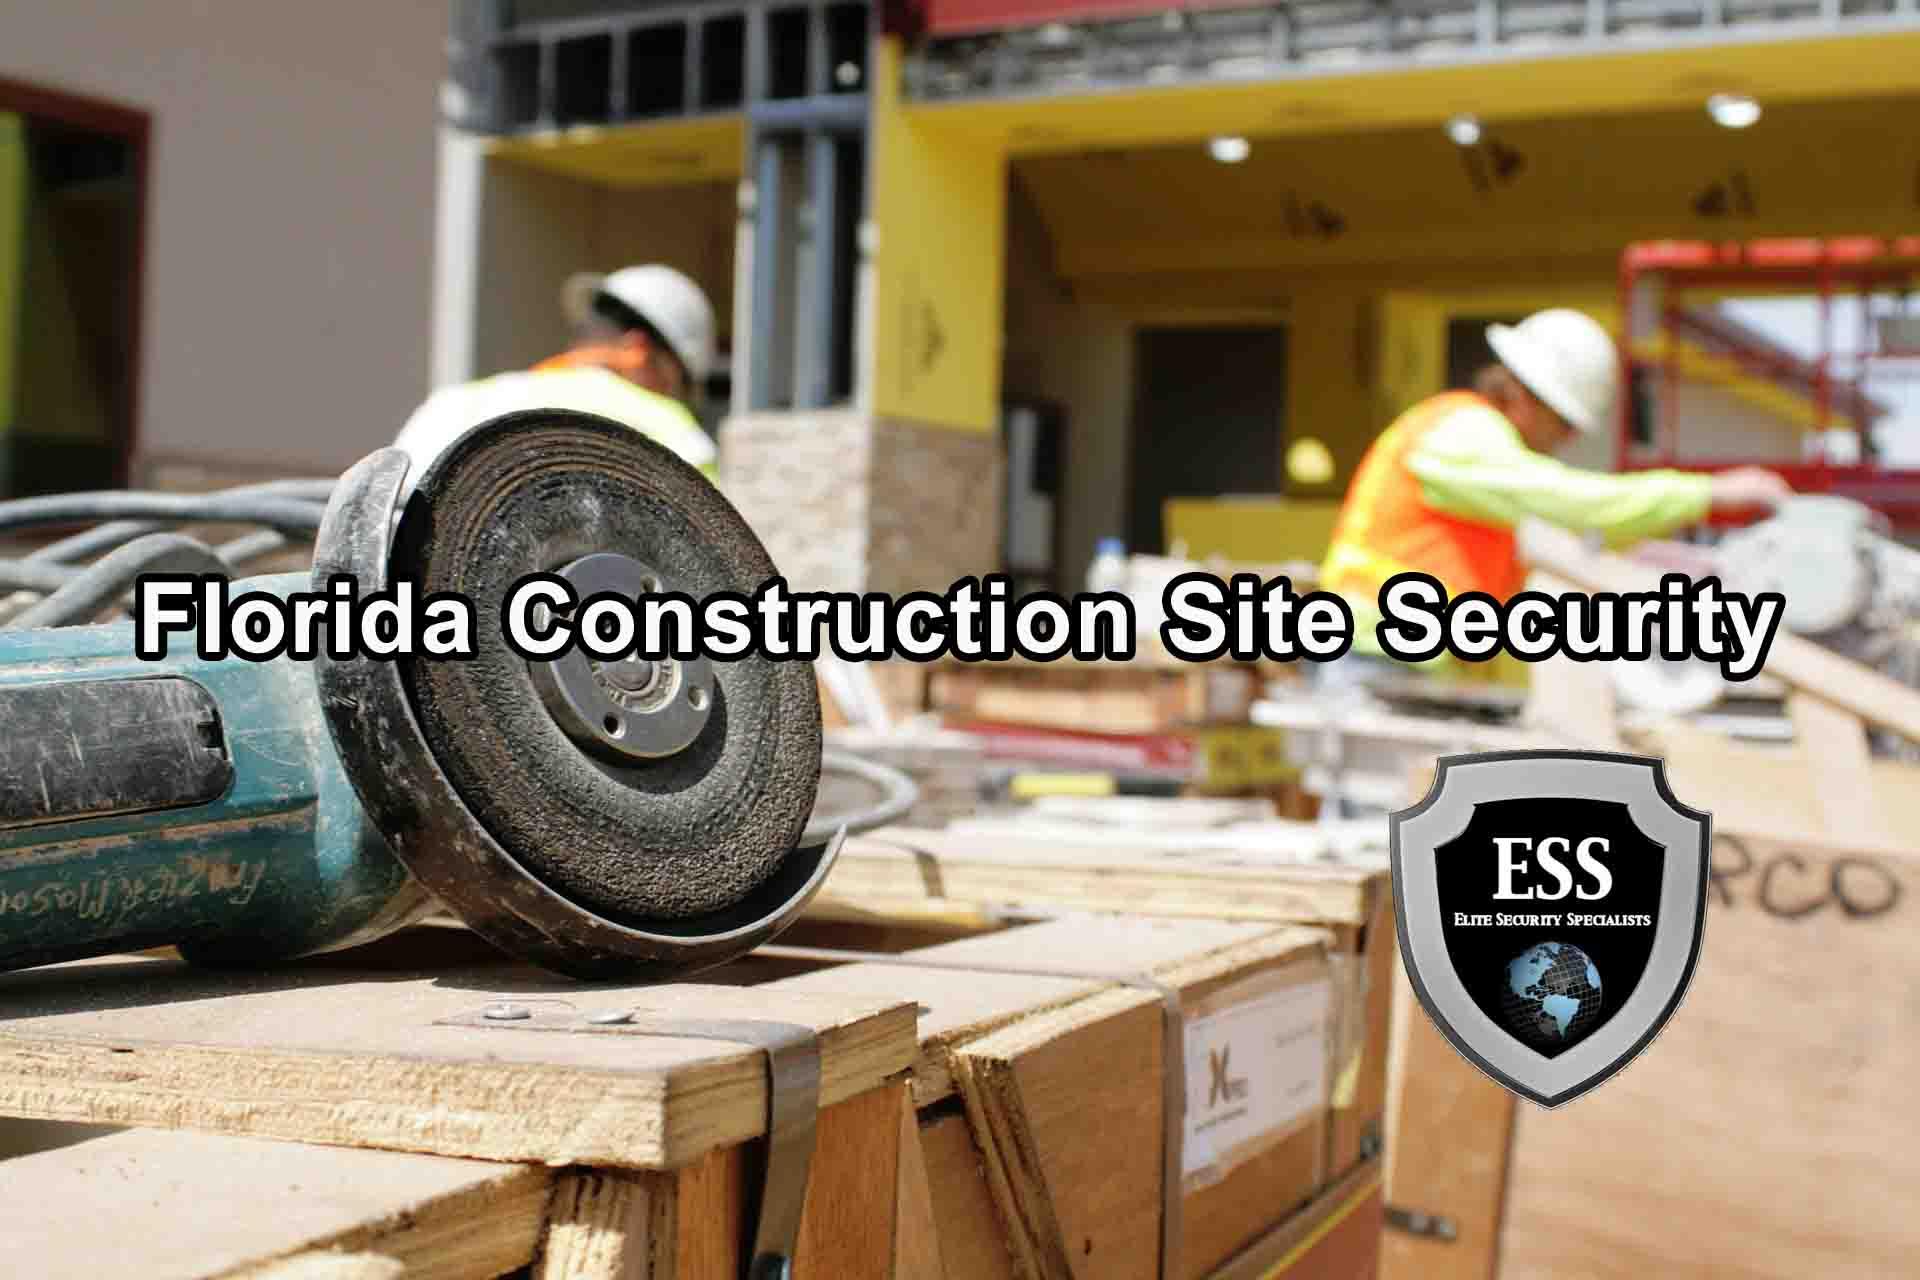 Florida Construction Site Security